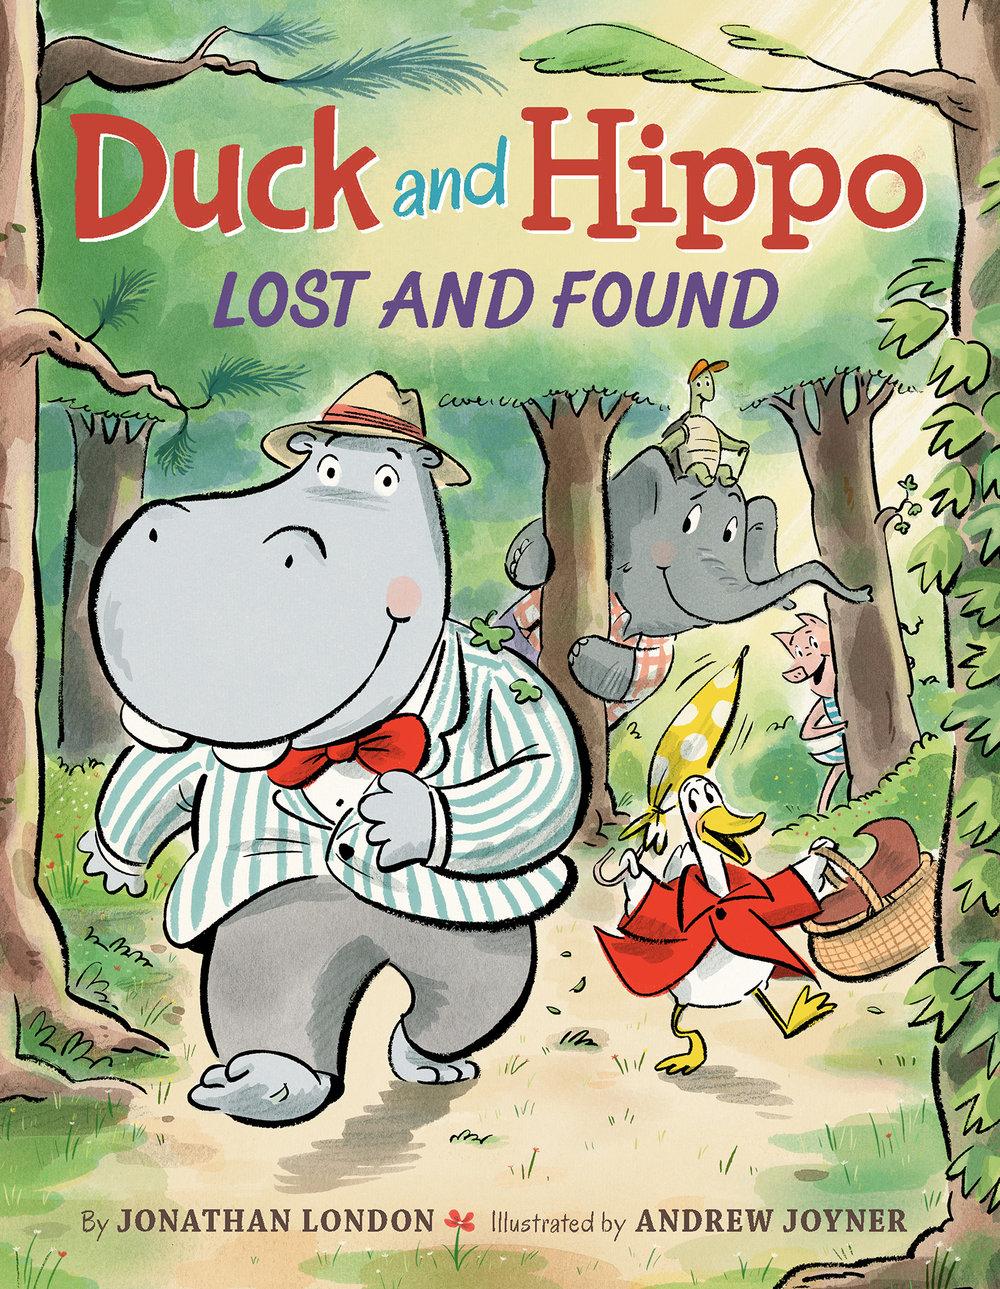 DuckandHippo-LostandFound-Cover.jpg